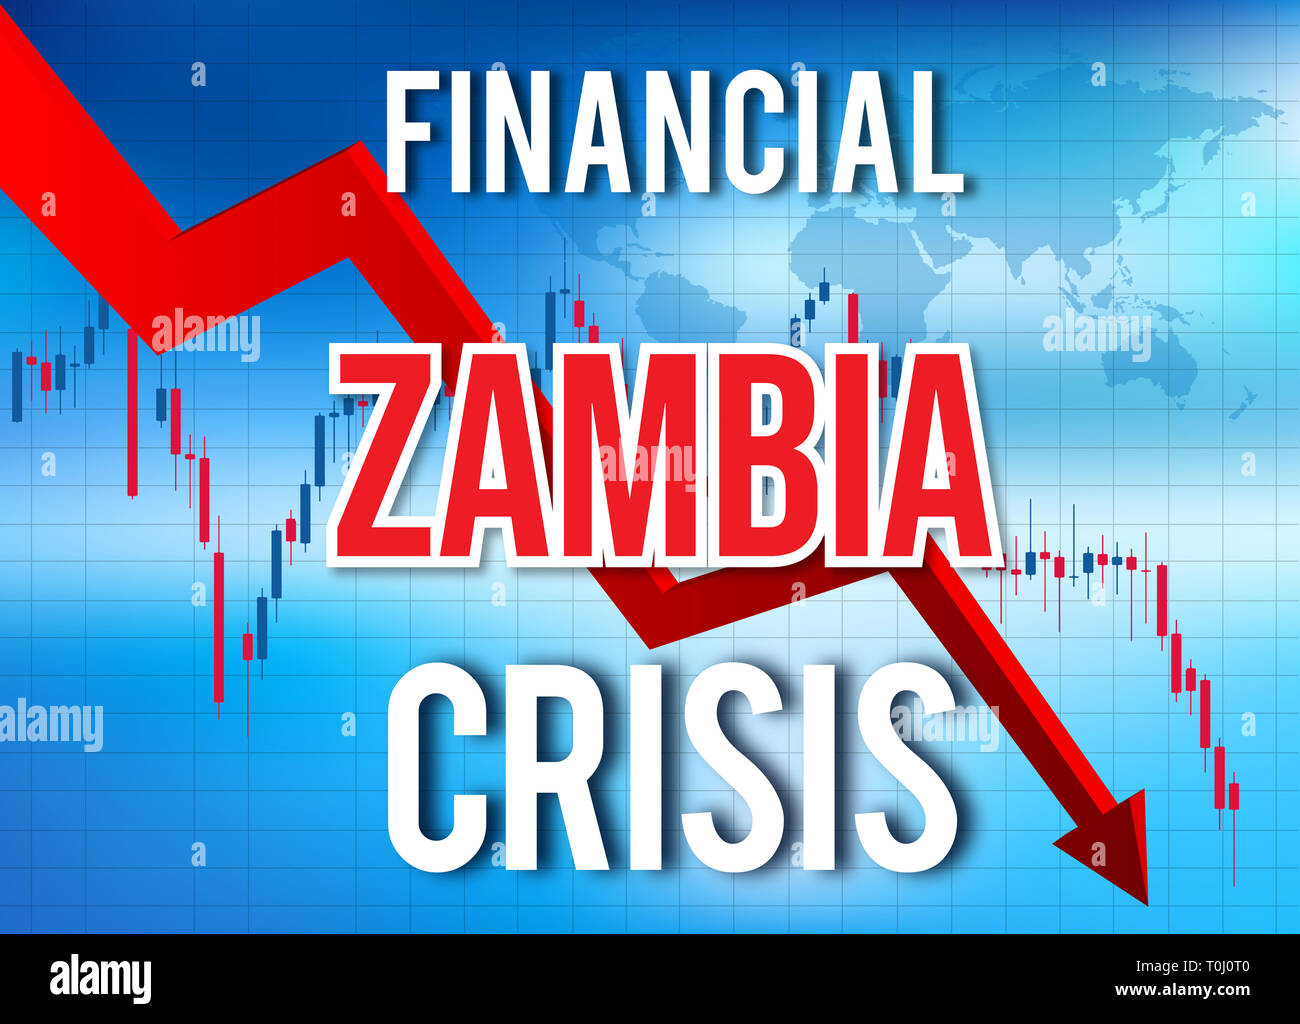 Zambia Financial Crisis Economic Collapse Market Crash Global Meltdown Illustration. - Stock Image